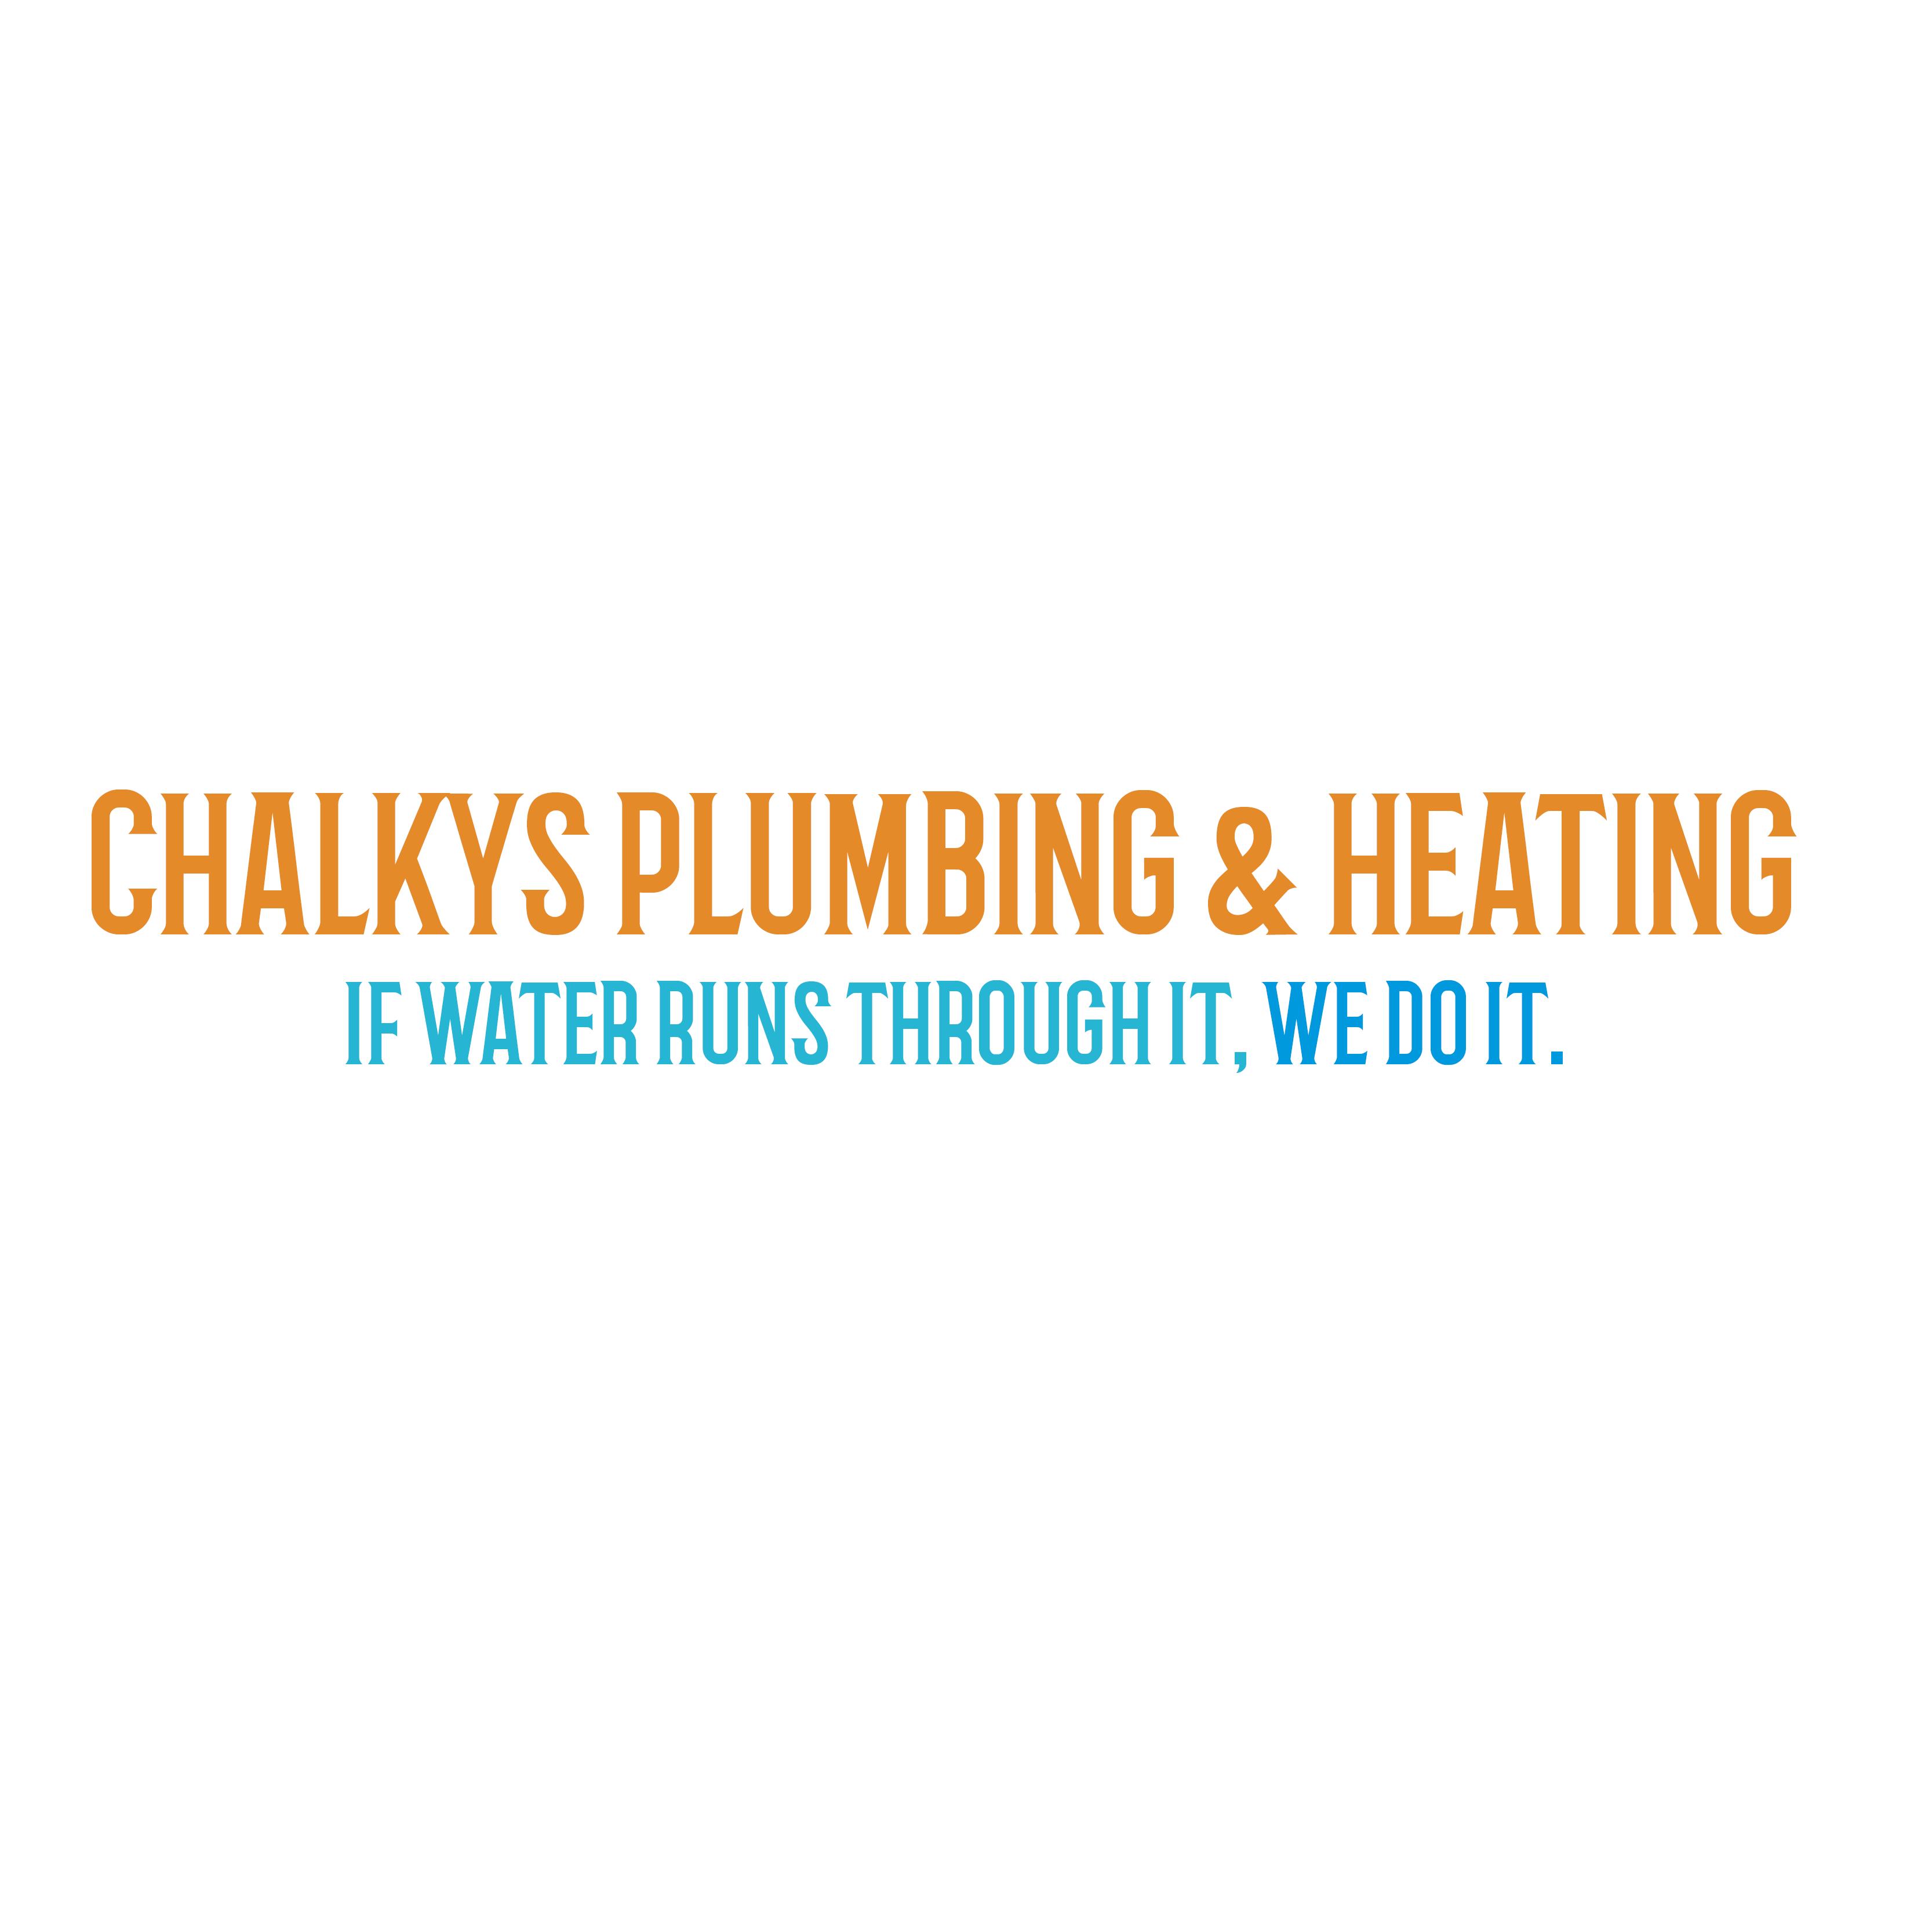 Chalkys Plumbing & Heating Verified Logo